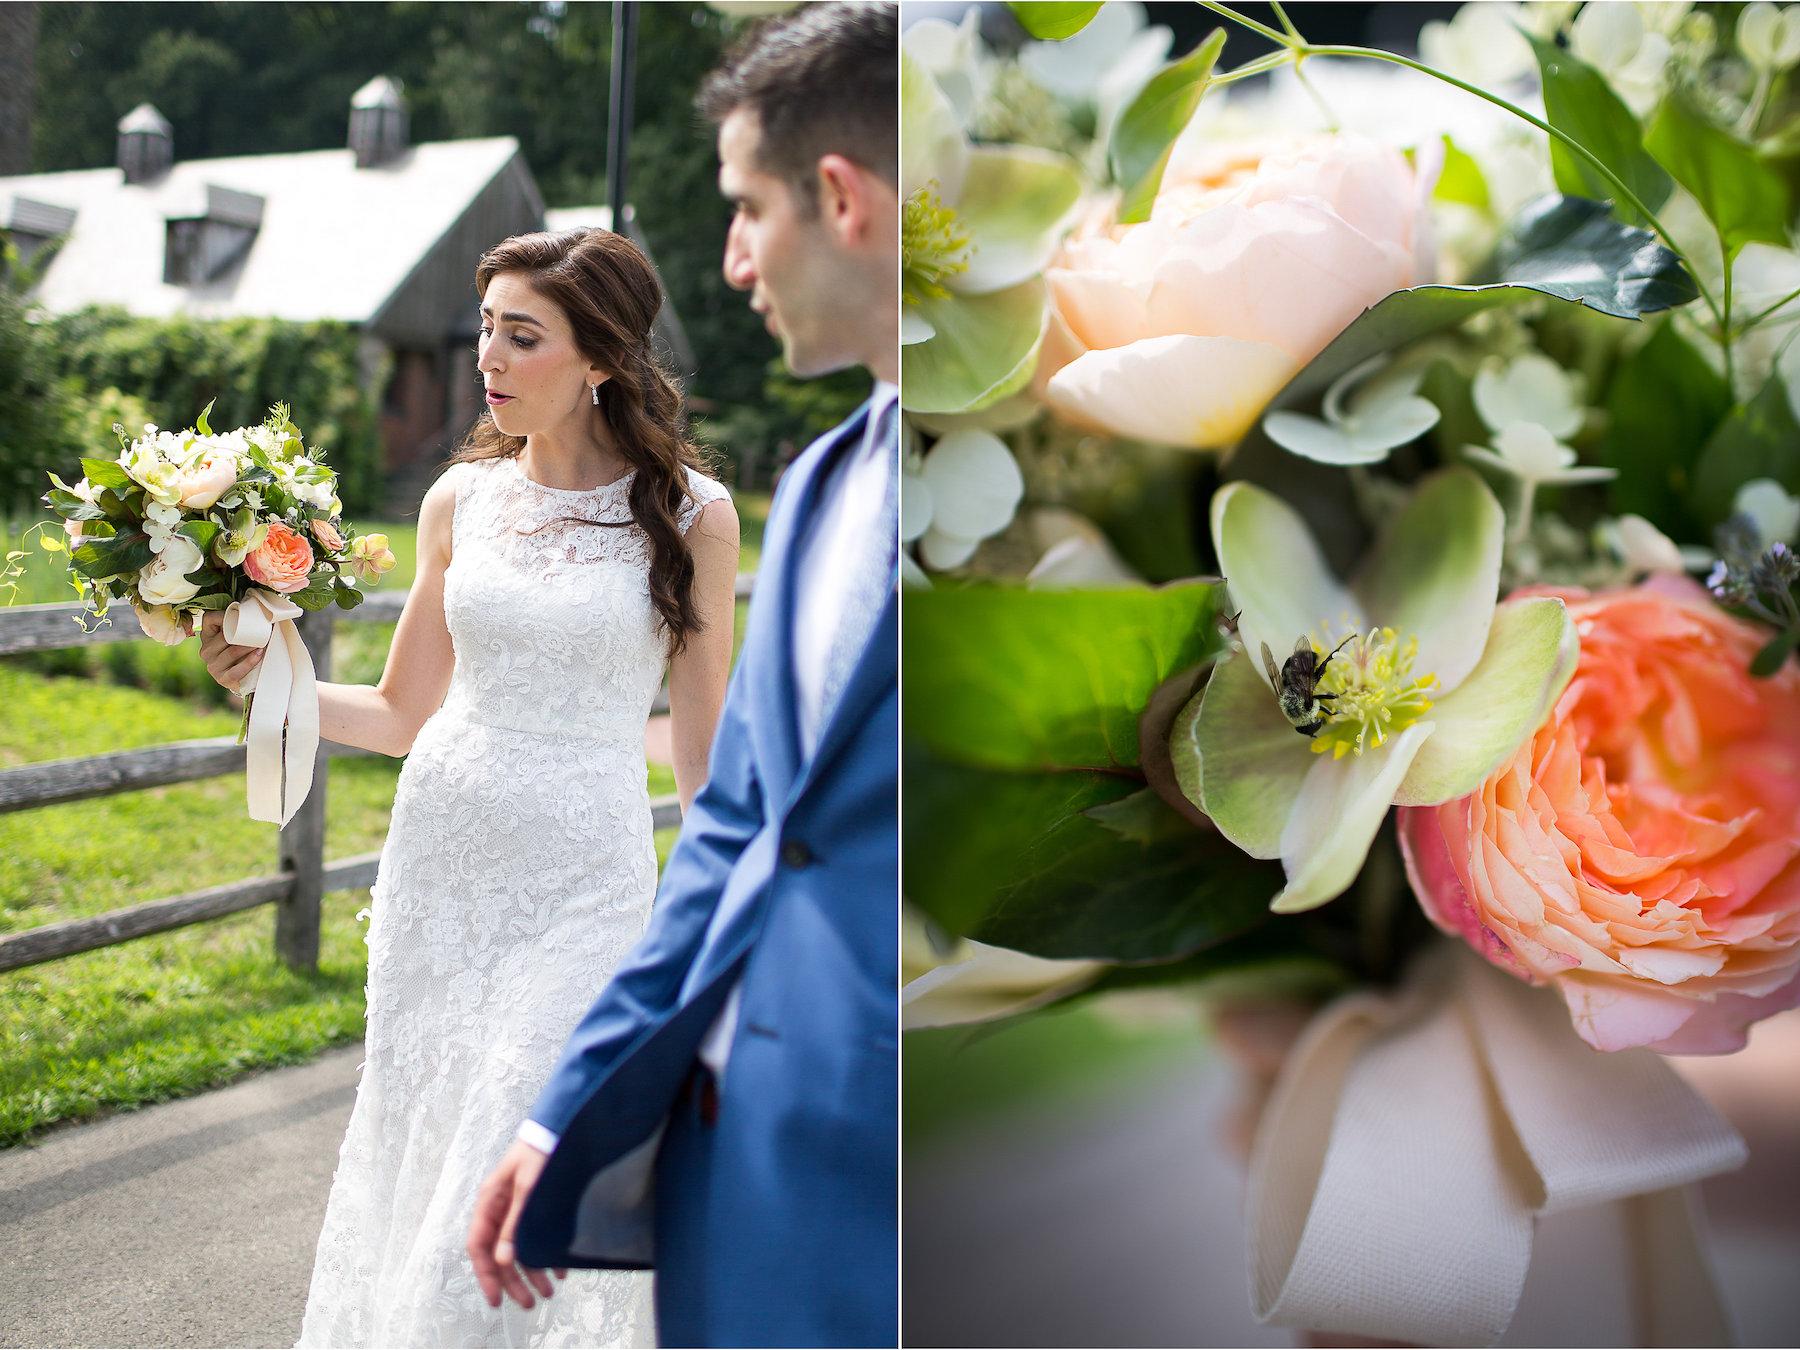 Summer Farm to Table Wedding - Denise Fasanello Flowers 19.jpg